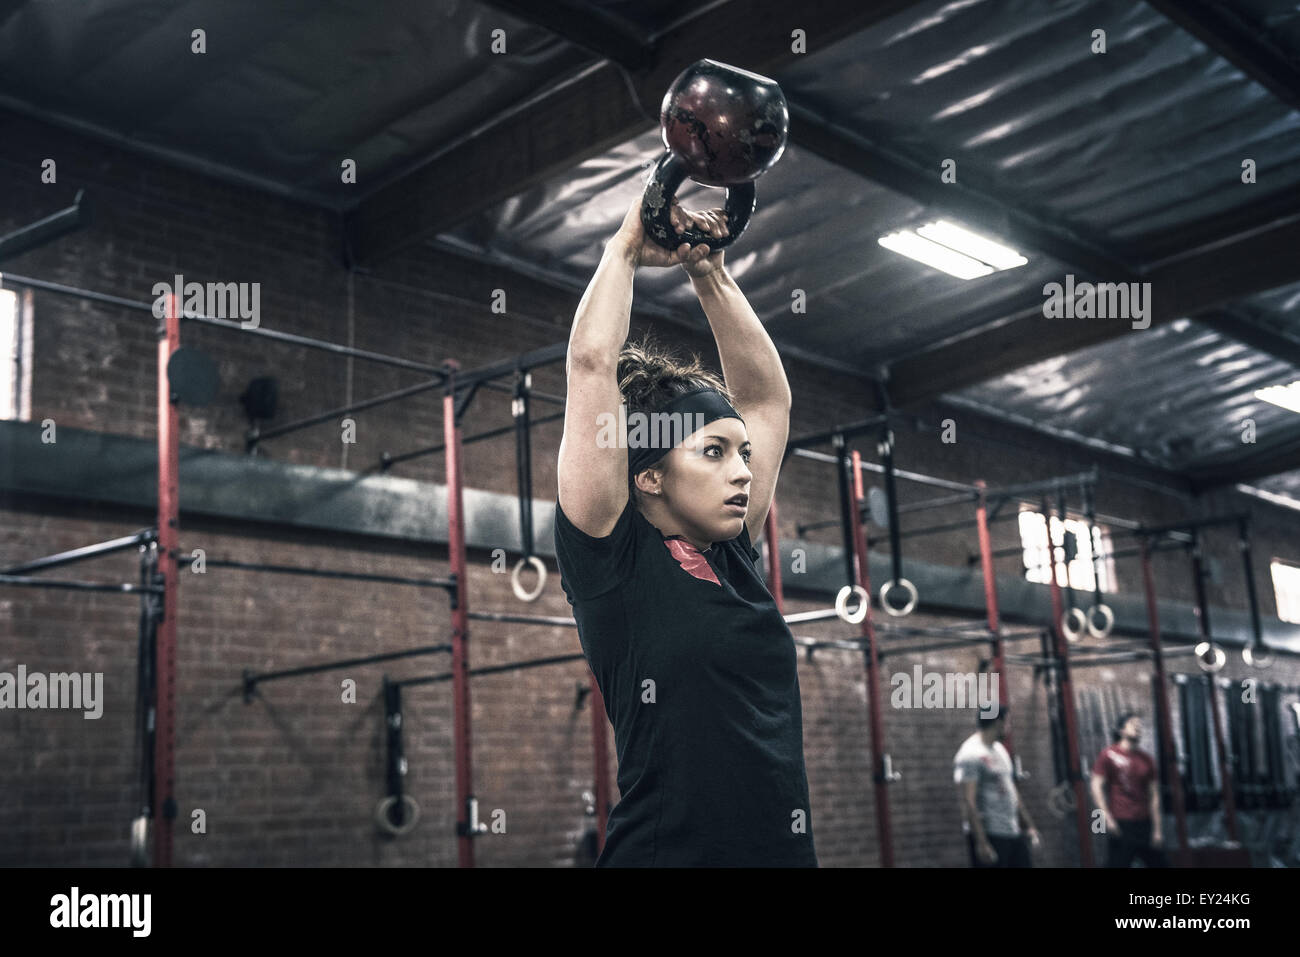 Junge Frau hält Wasserkocher Glocken im Fitness-Studio Stockfoto